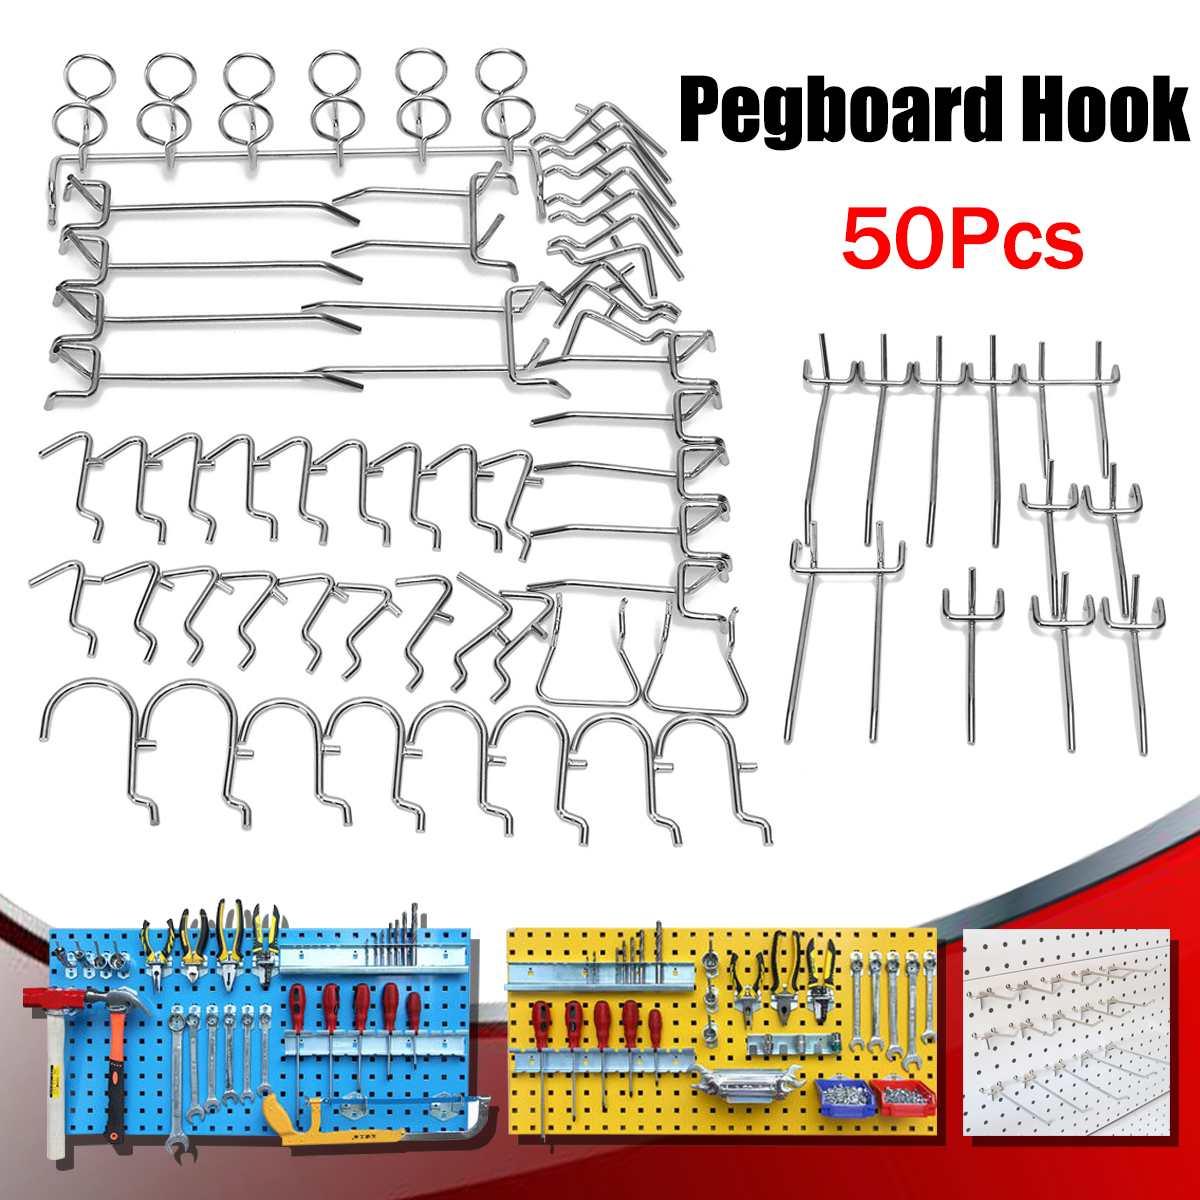 50X Stores Pegboard Hooks Assortment Organizing Hange Kit Market Storage Garage Hanging Tool Storage Hooks